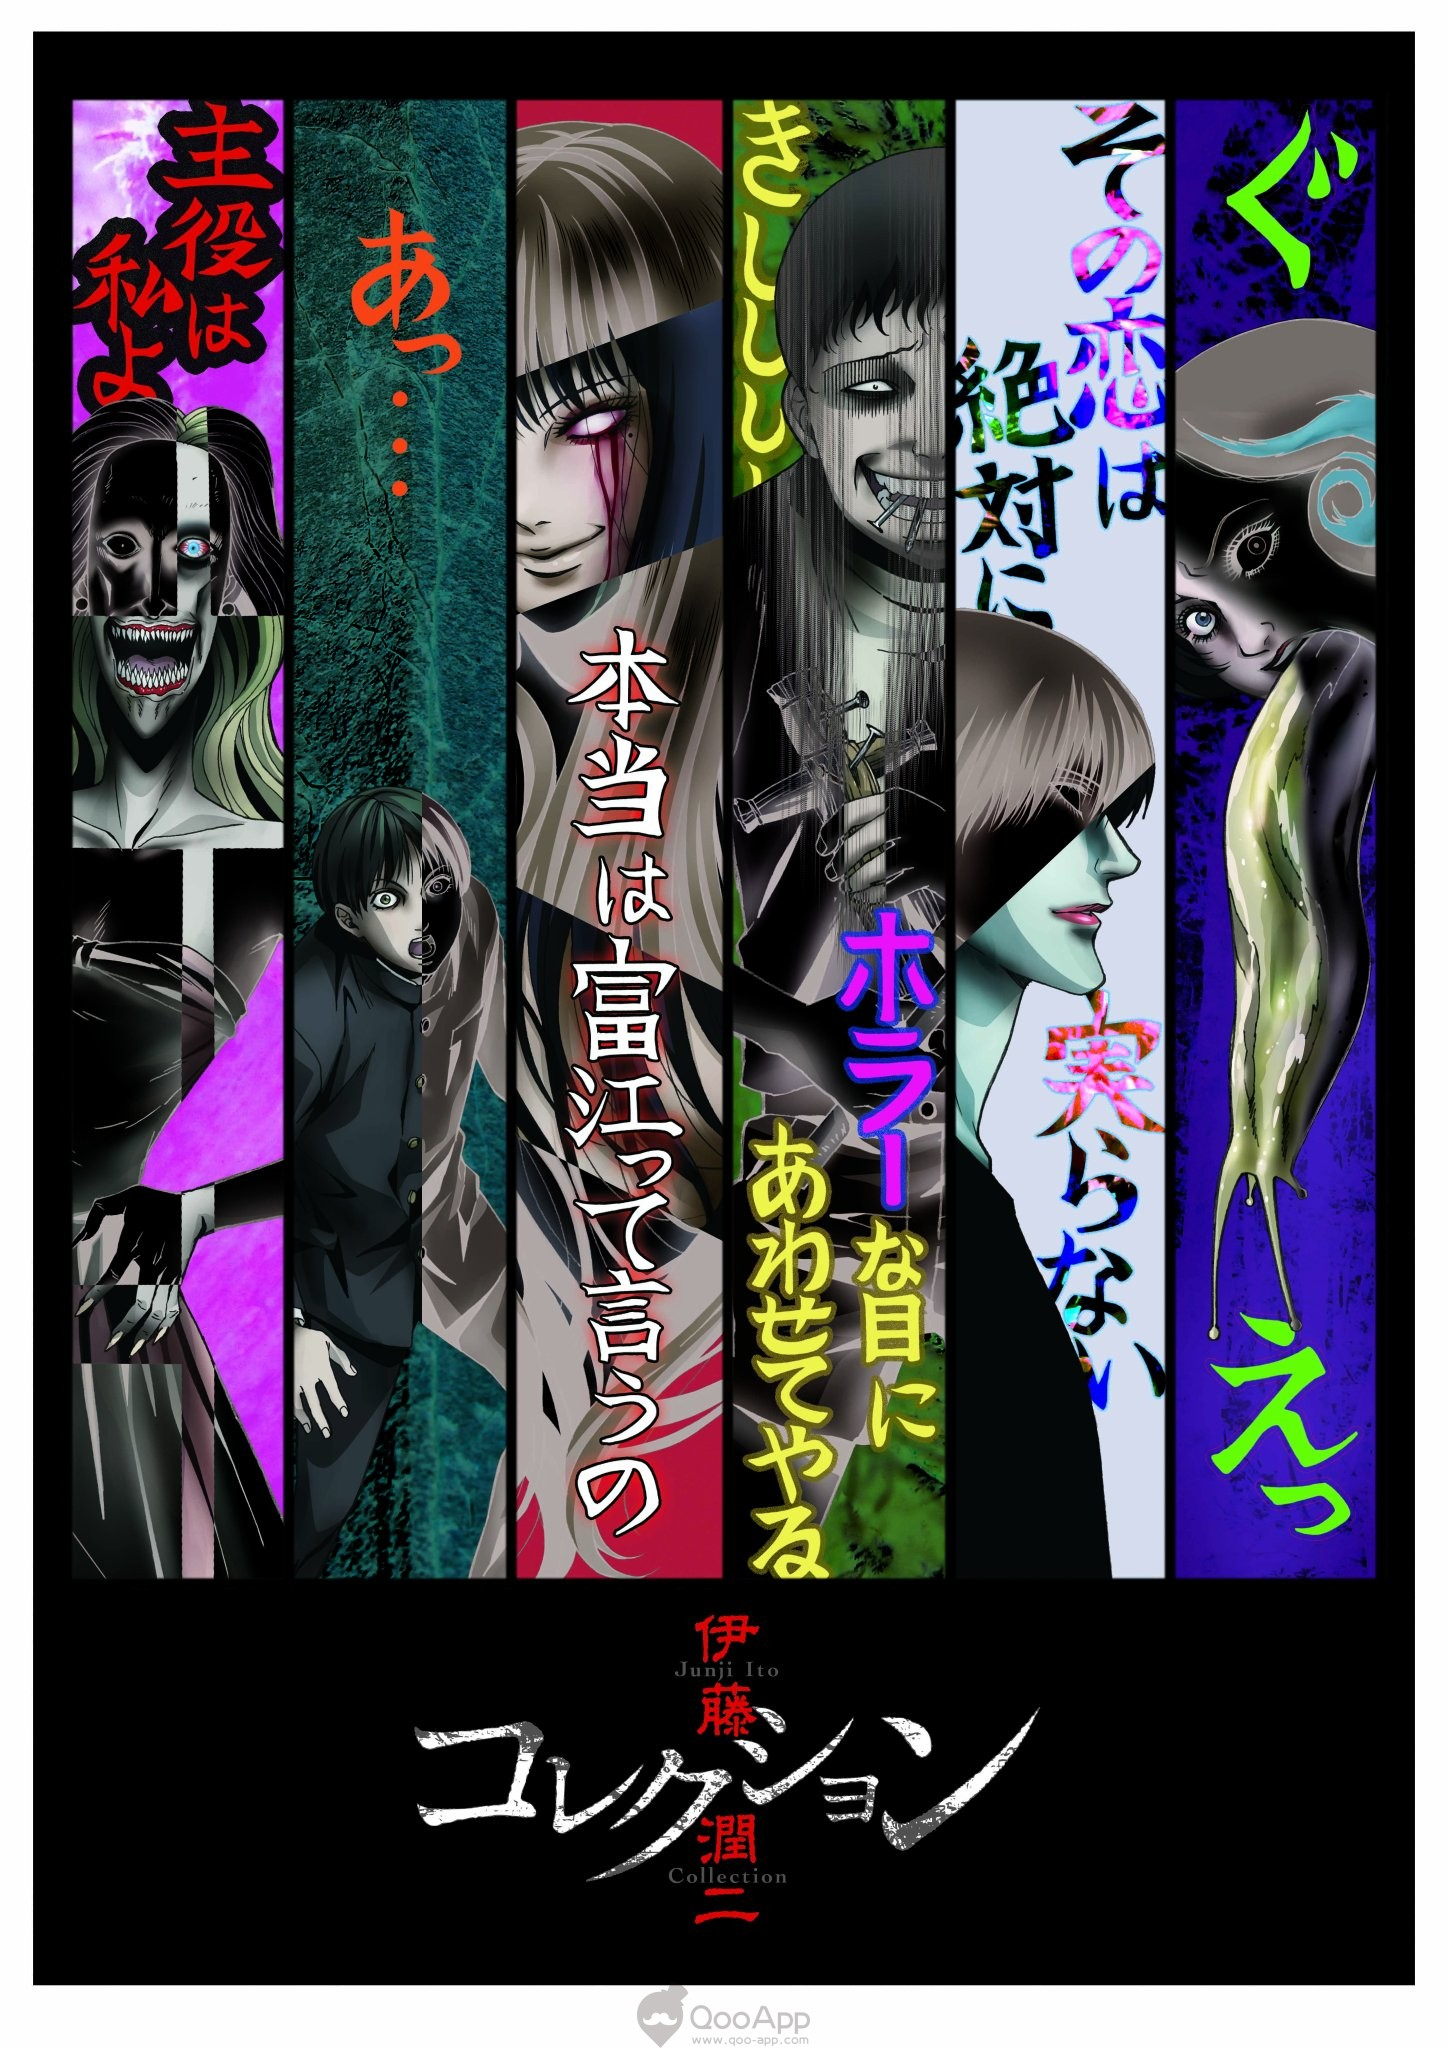 junji-ito-collection-resenha-poster